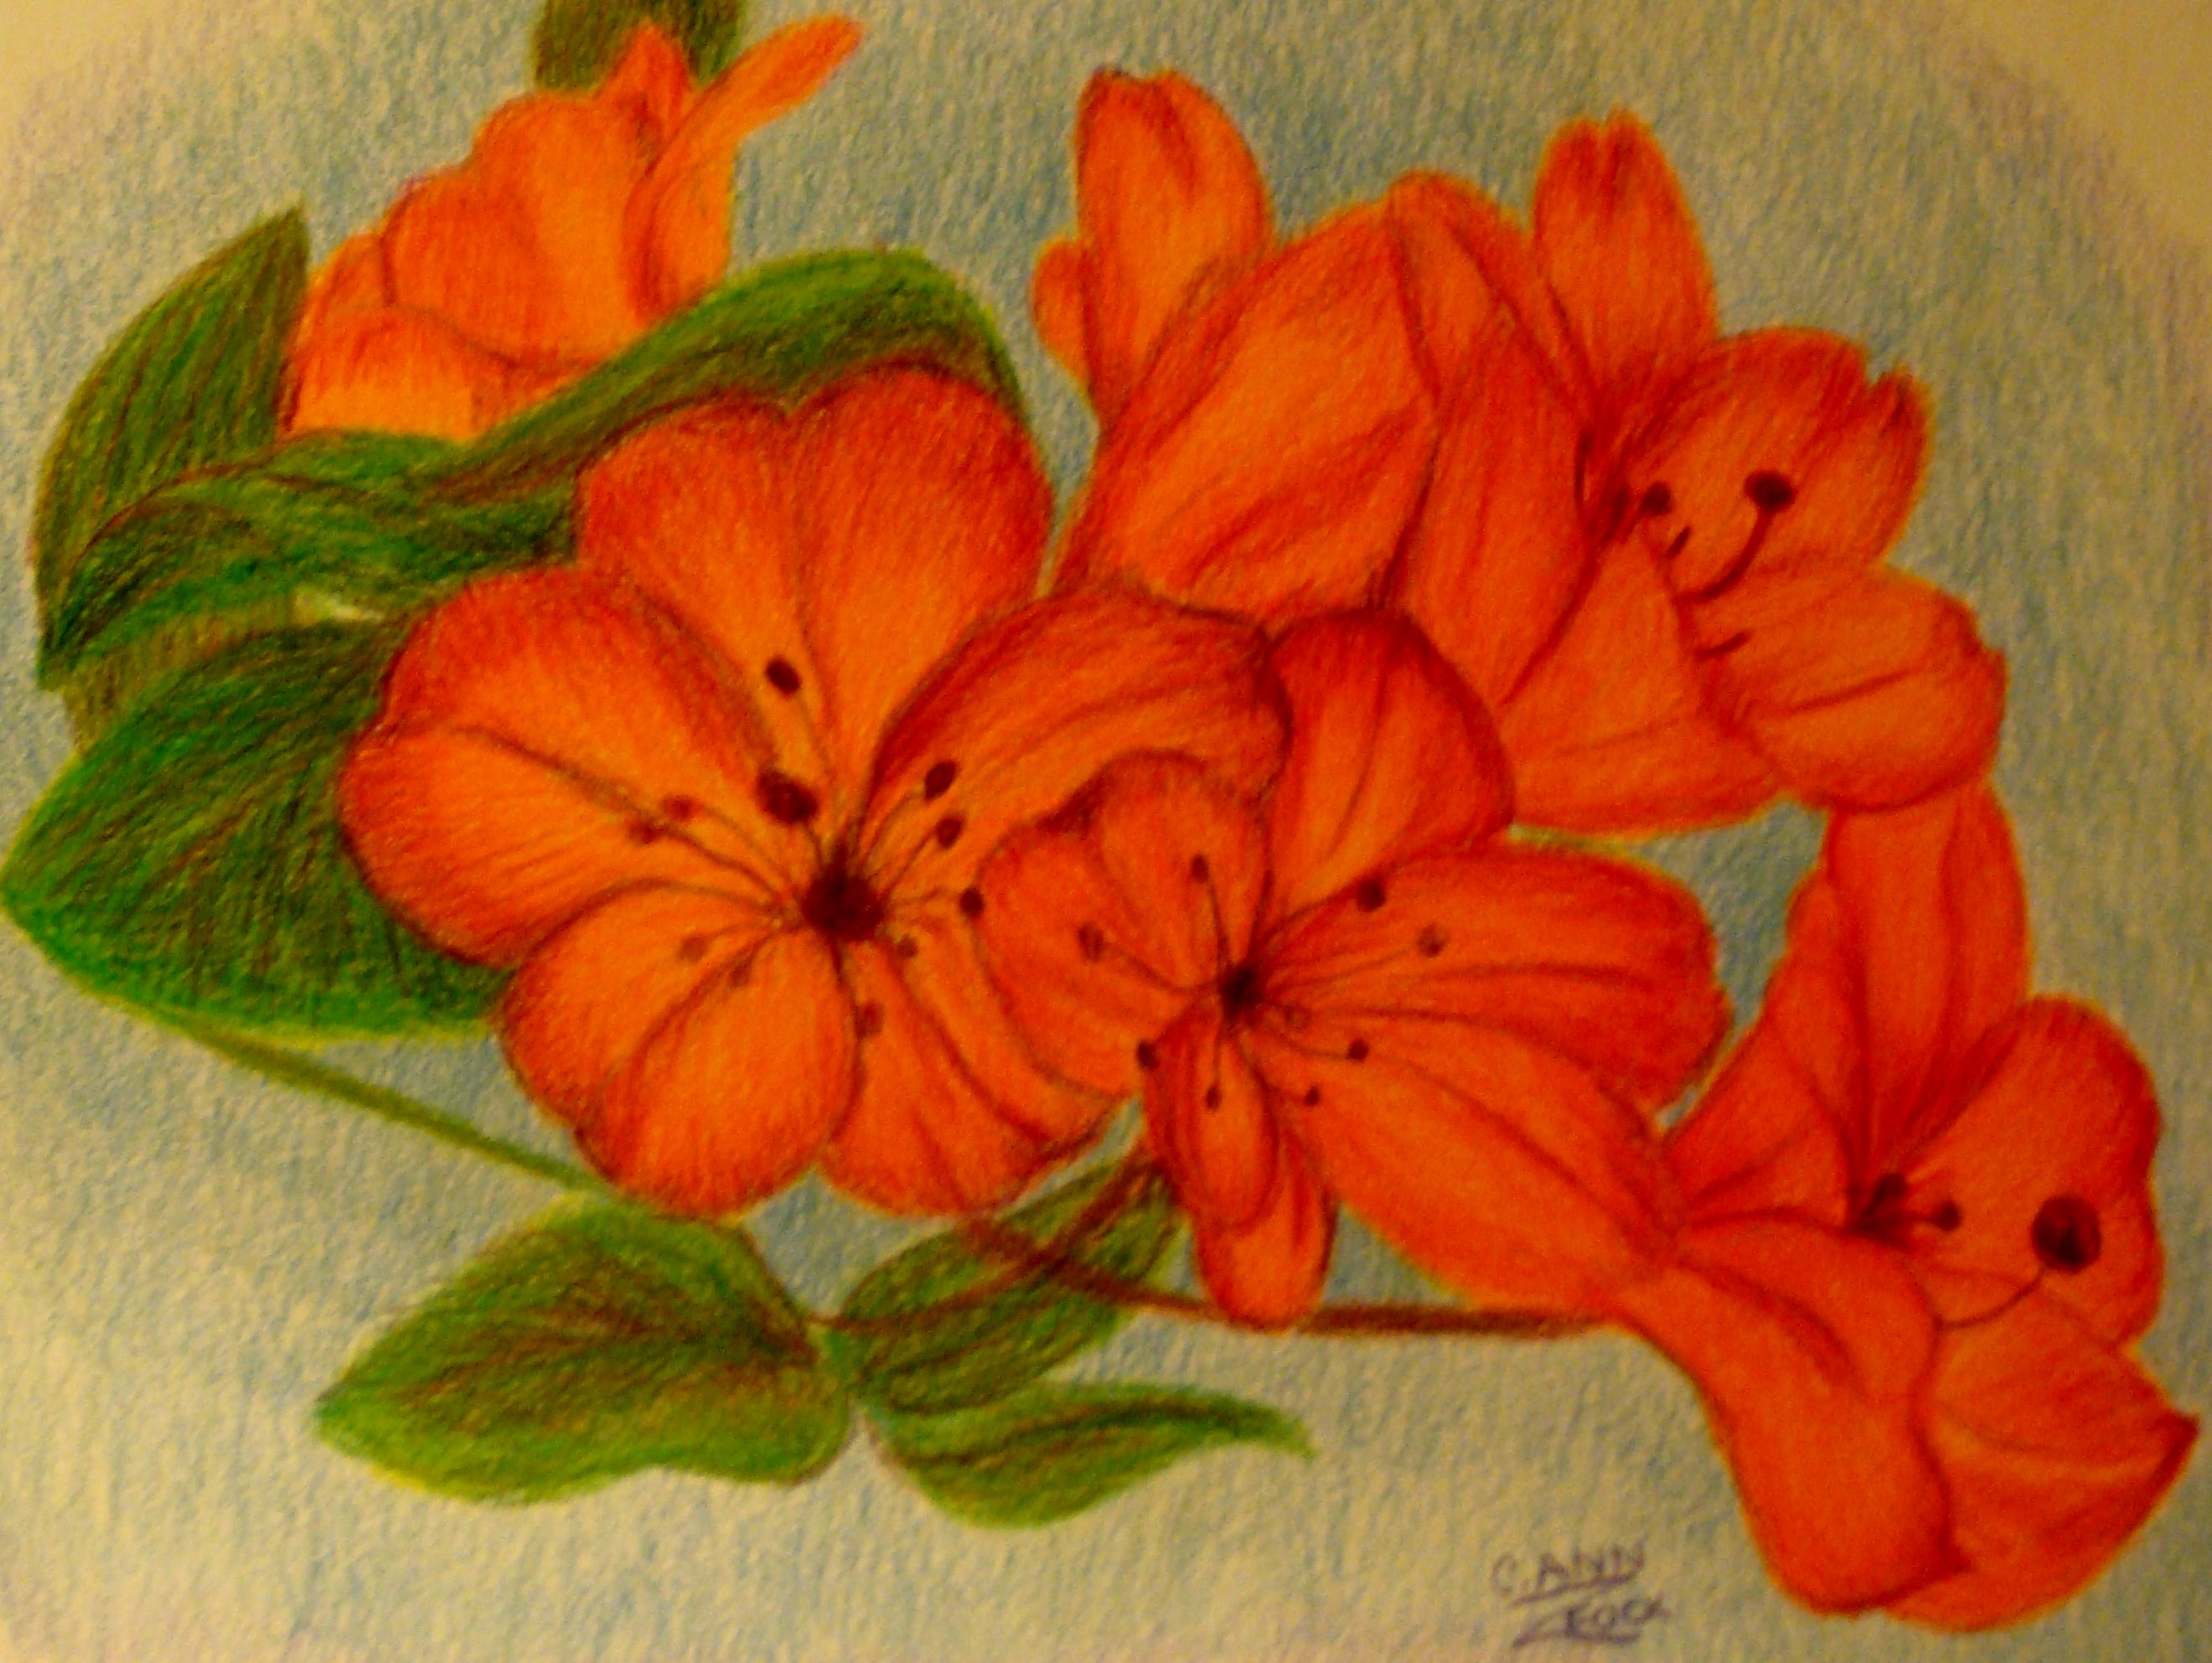 colored pencil drawing by carol zeock..orange flowers | my colored ...